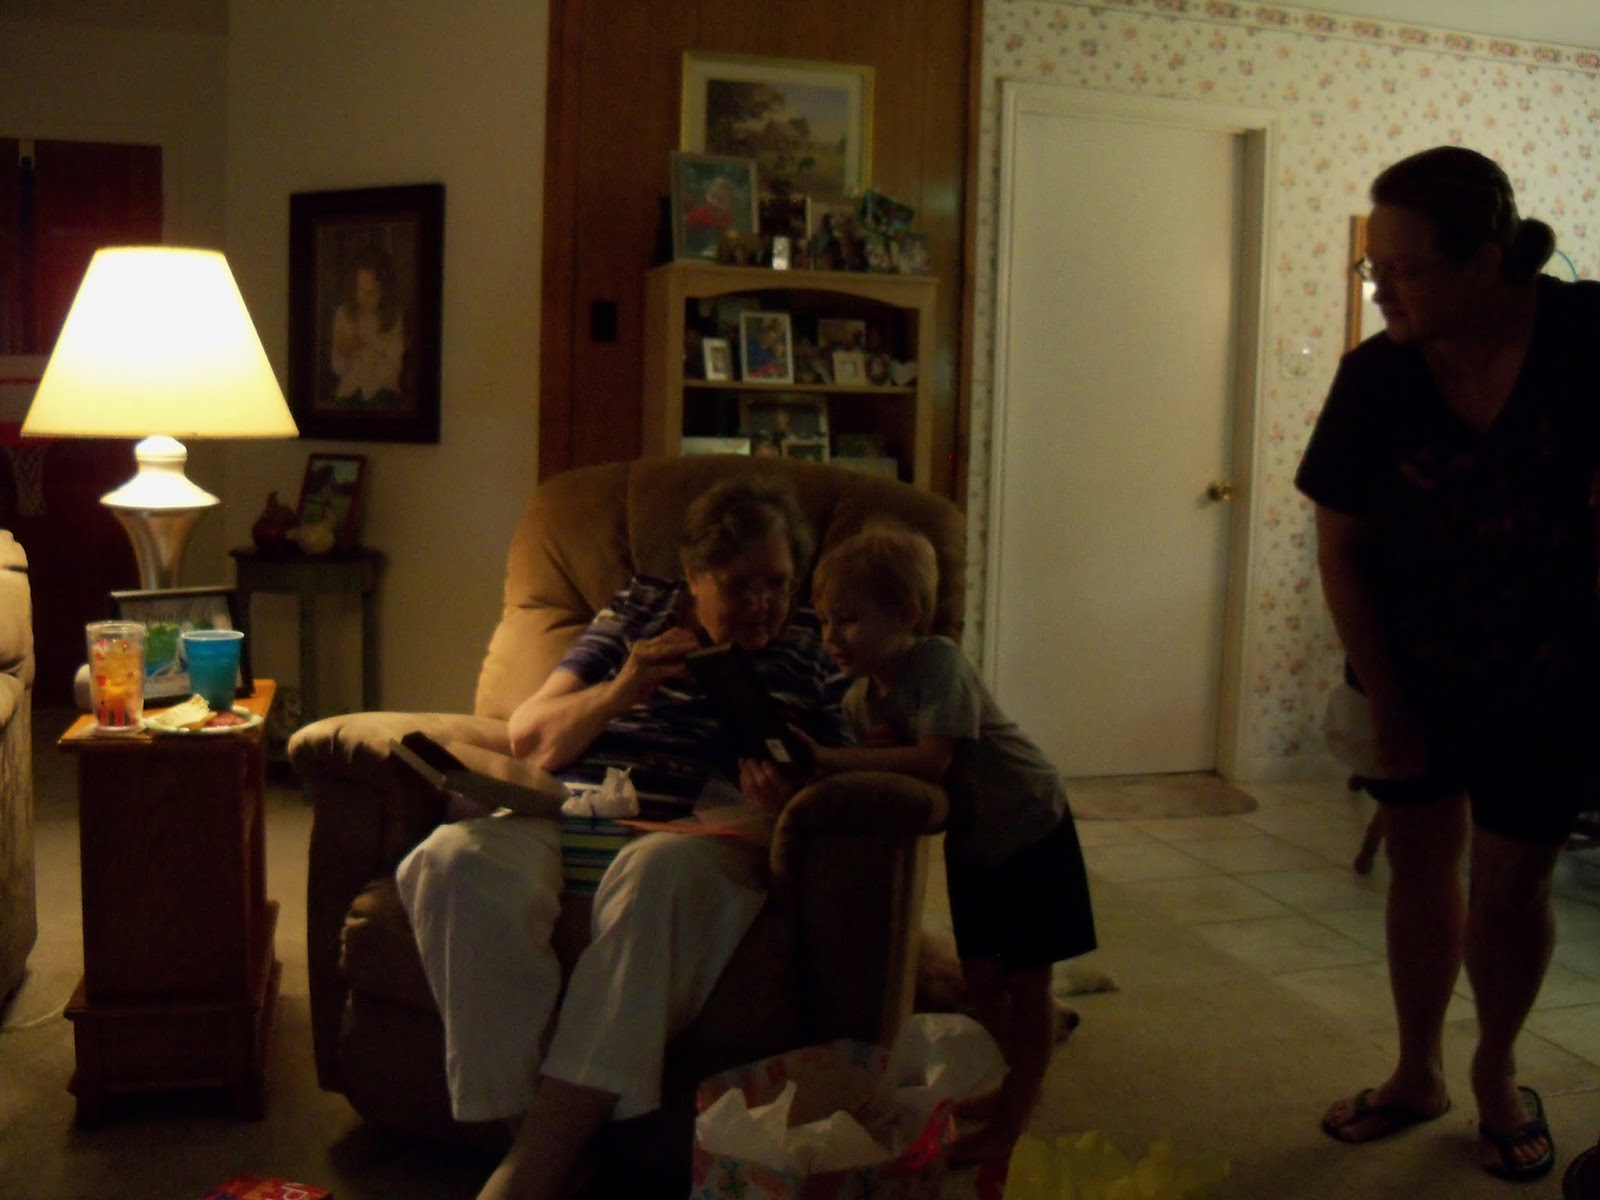 Moms 70th Birthday and Labor Day - 117_0074.JPG